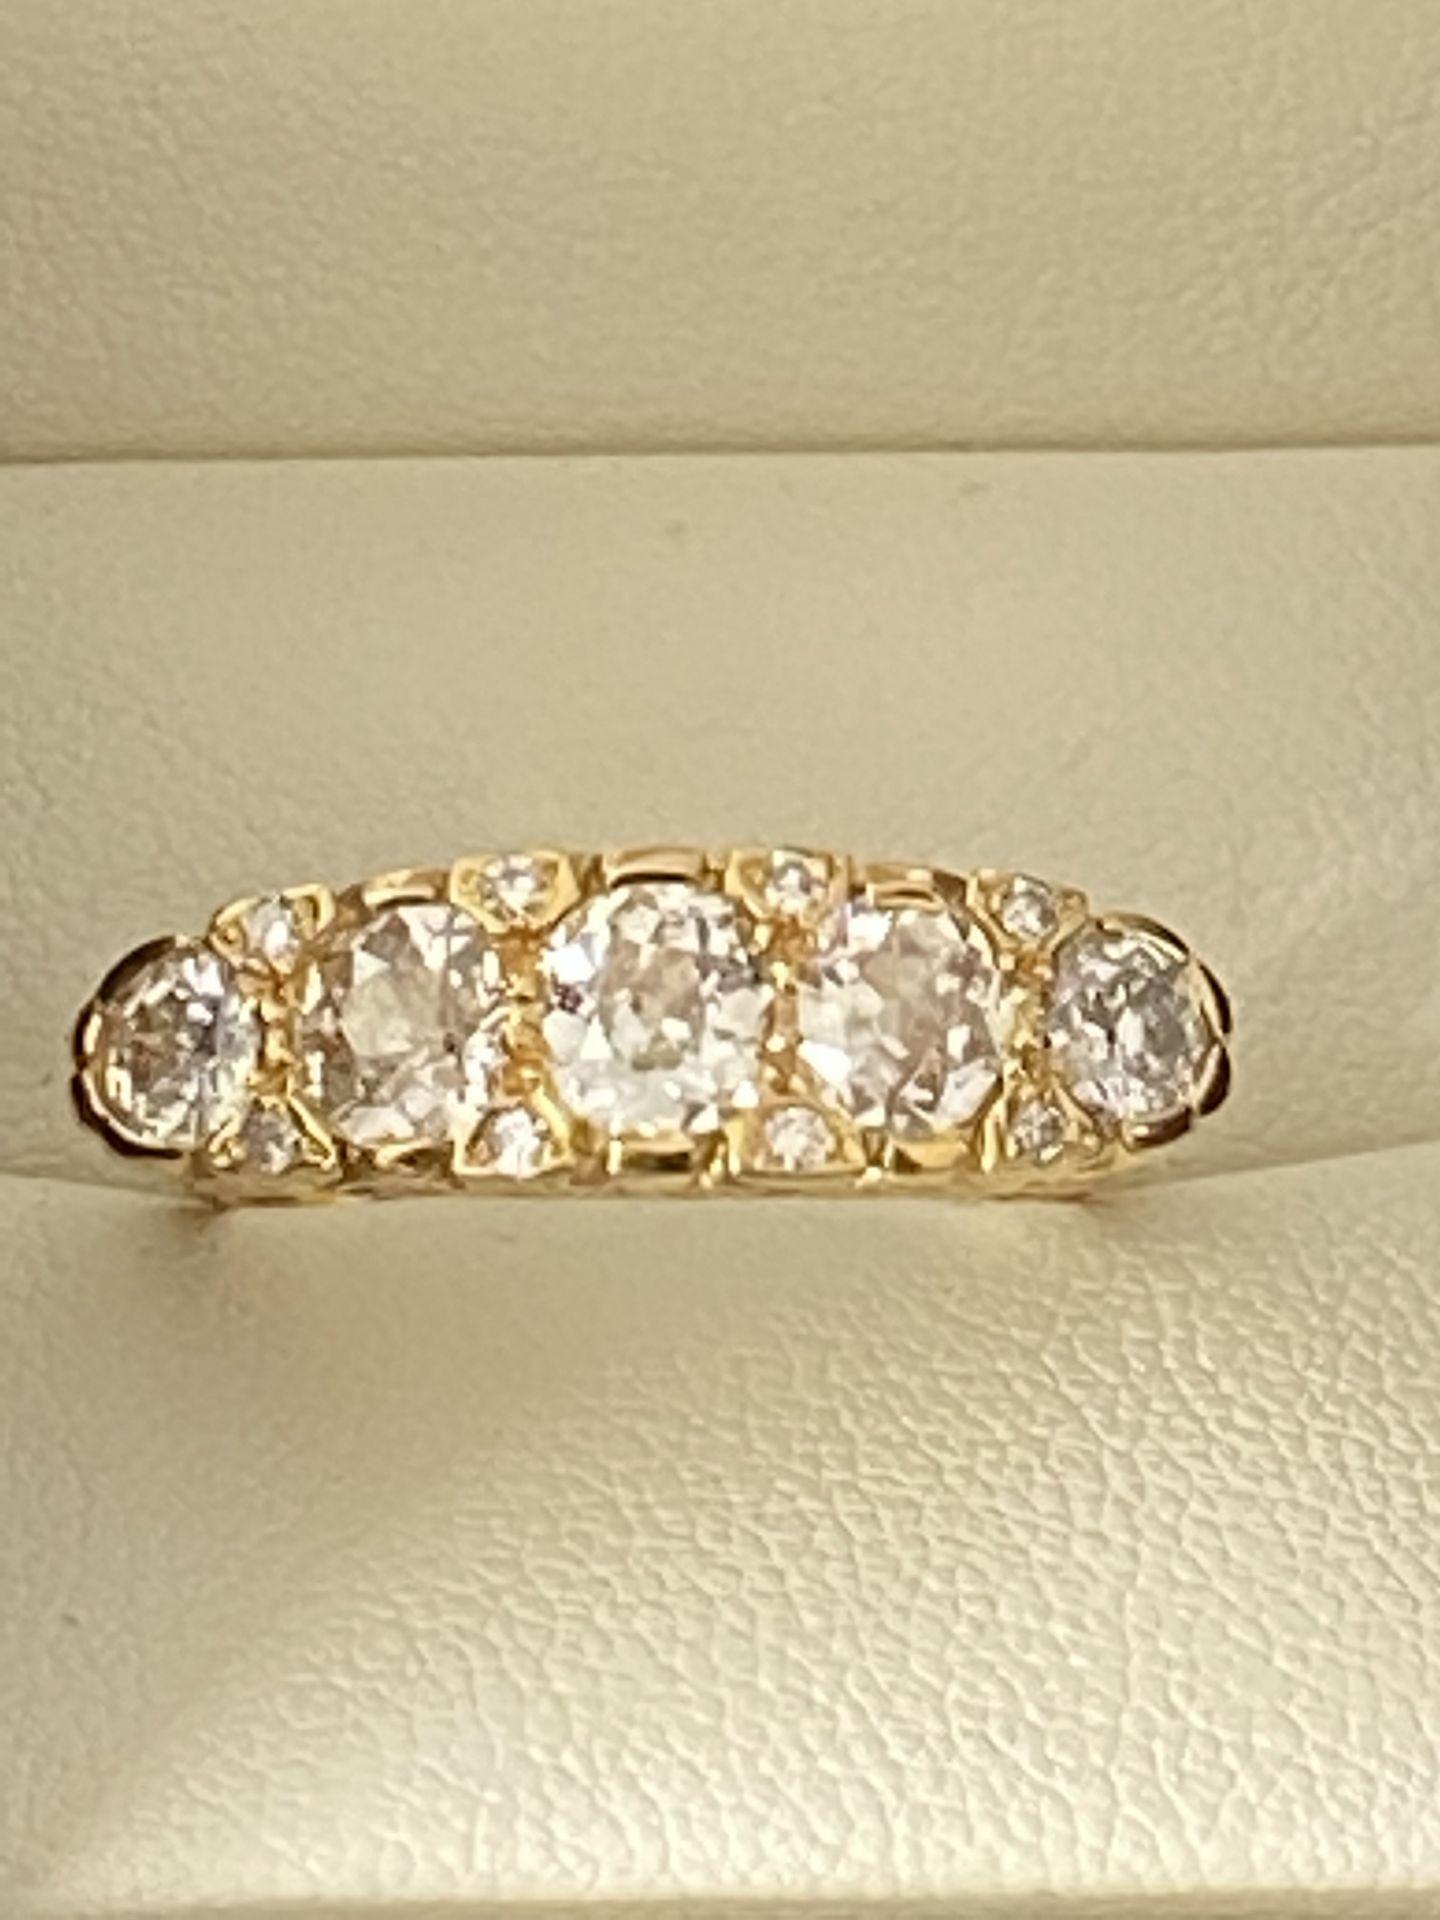 FINE 18ct YELLOW GOLD 2.00ct 5 STONE DIAMOND RING